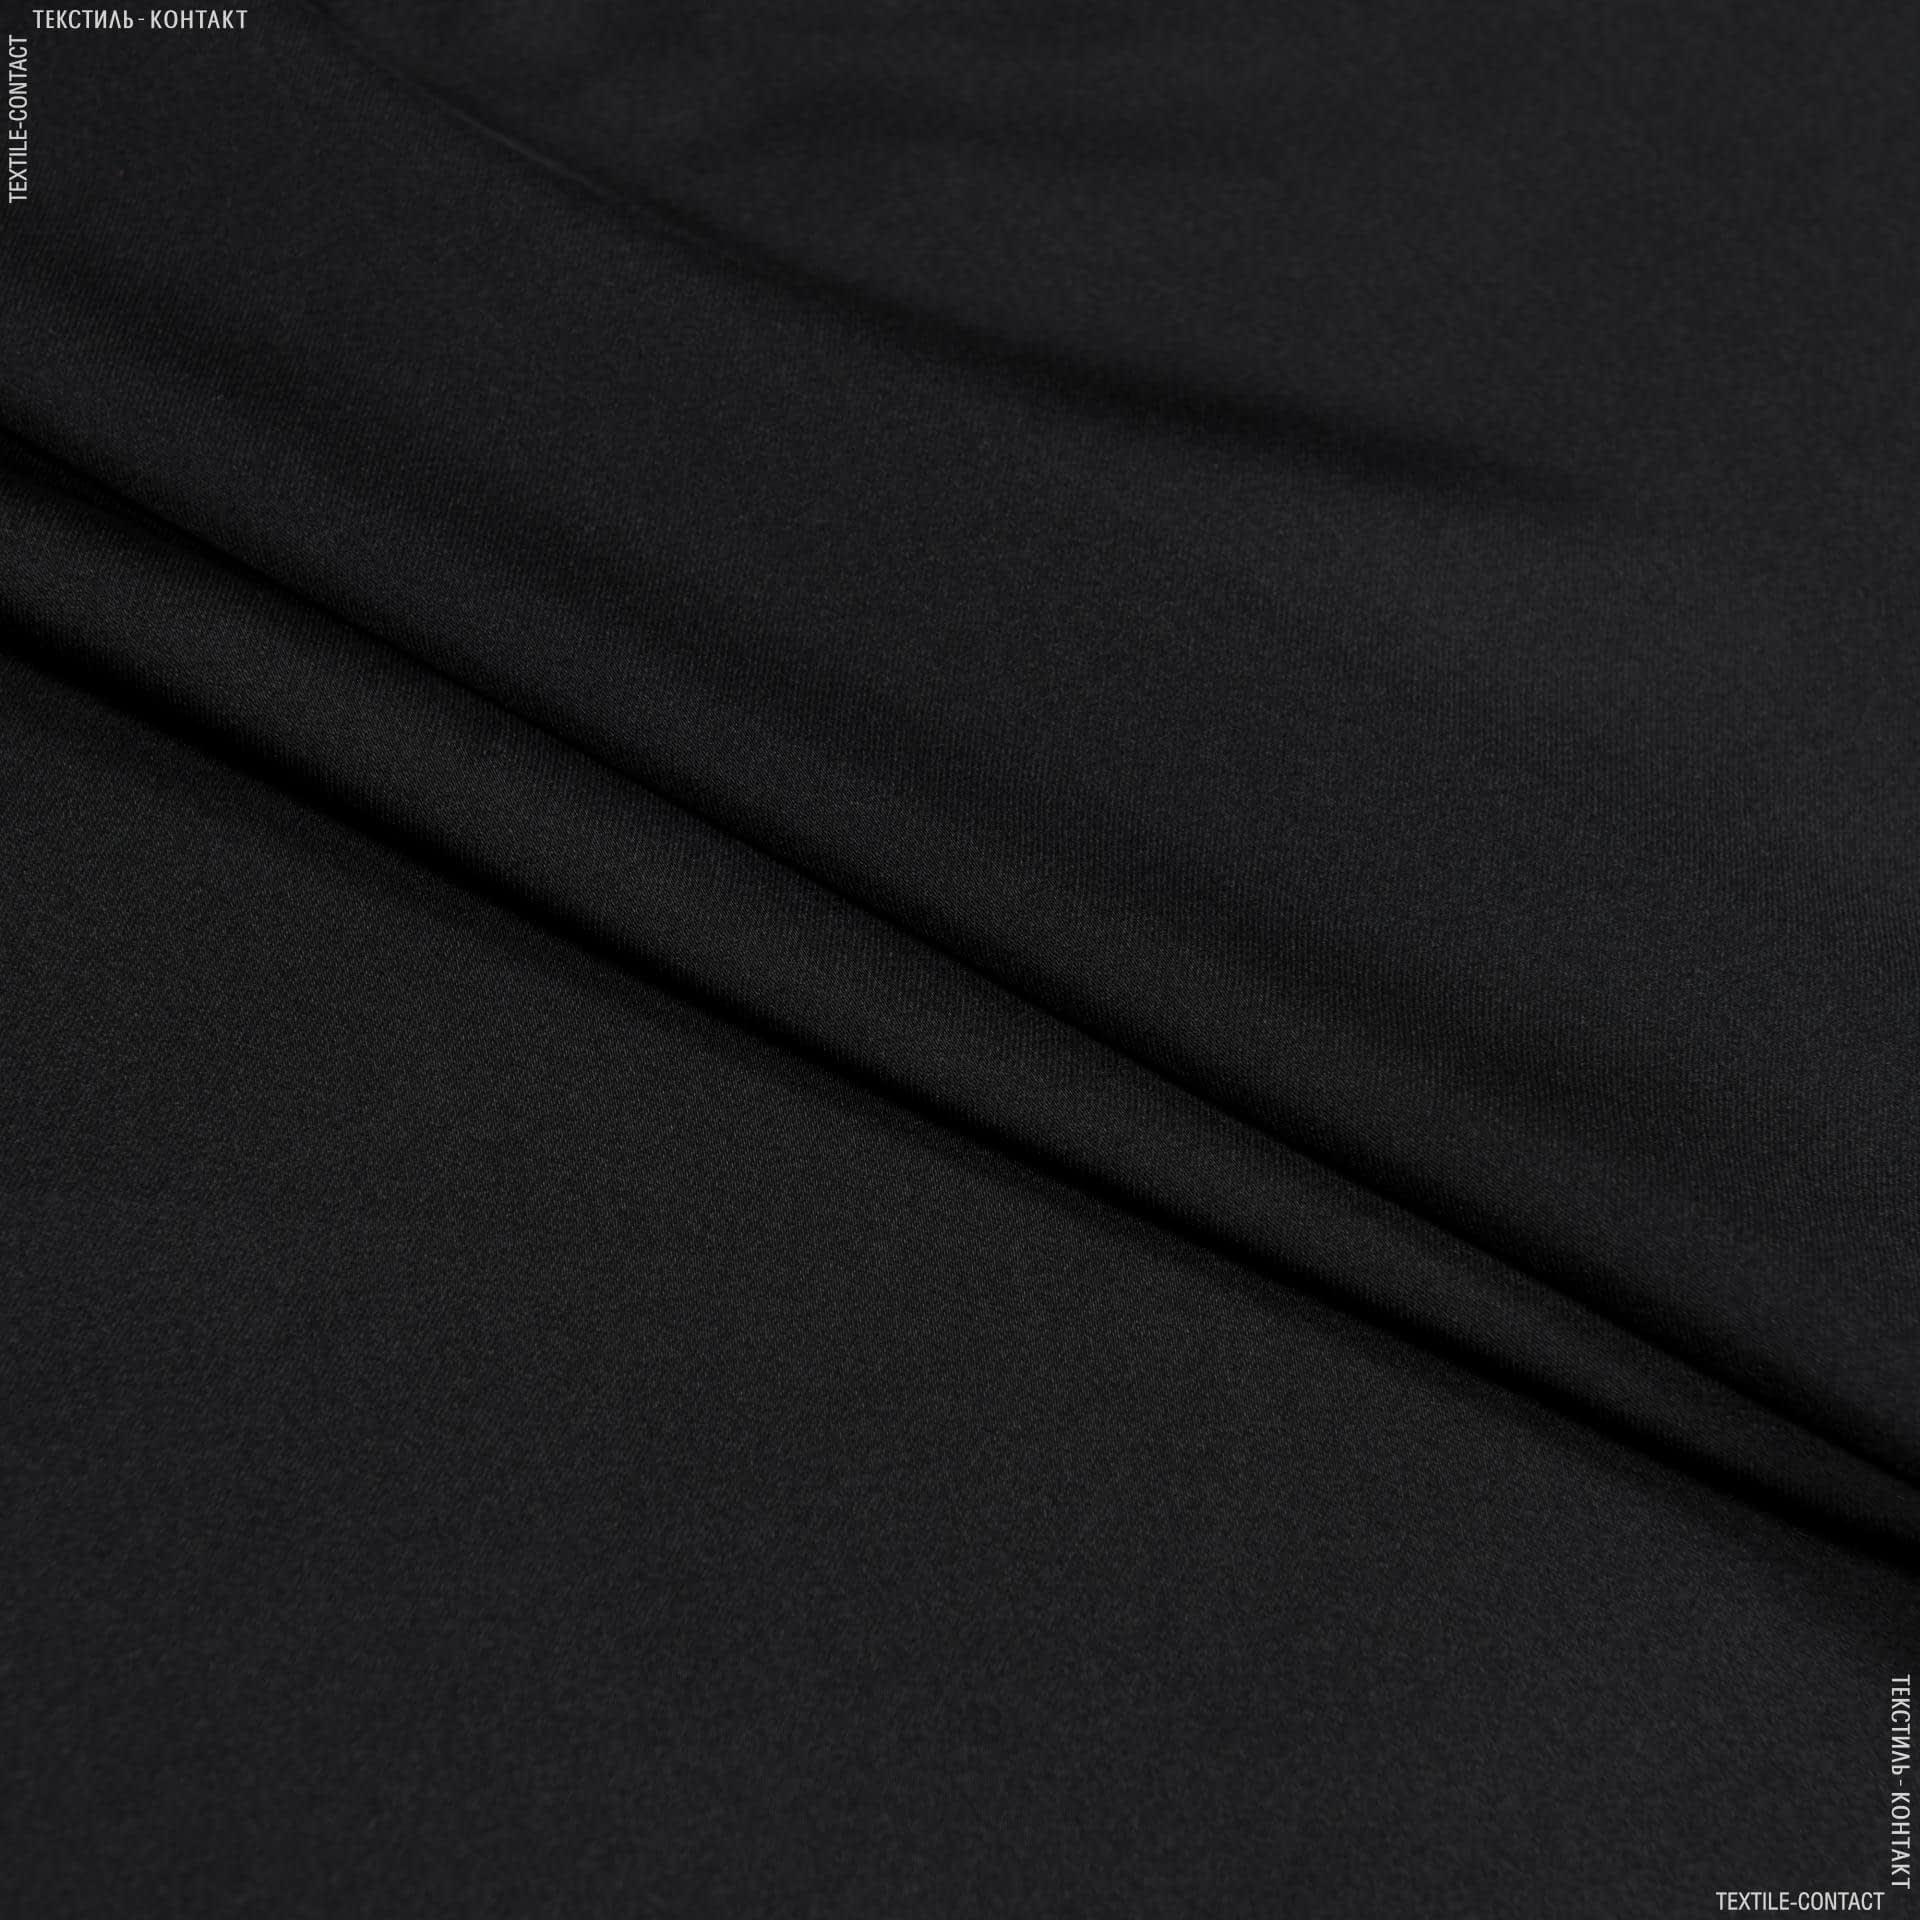 Тканини для хусток та бандан - Шовк штучний чорний